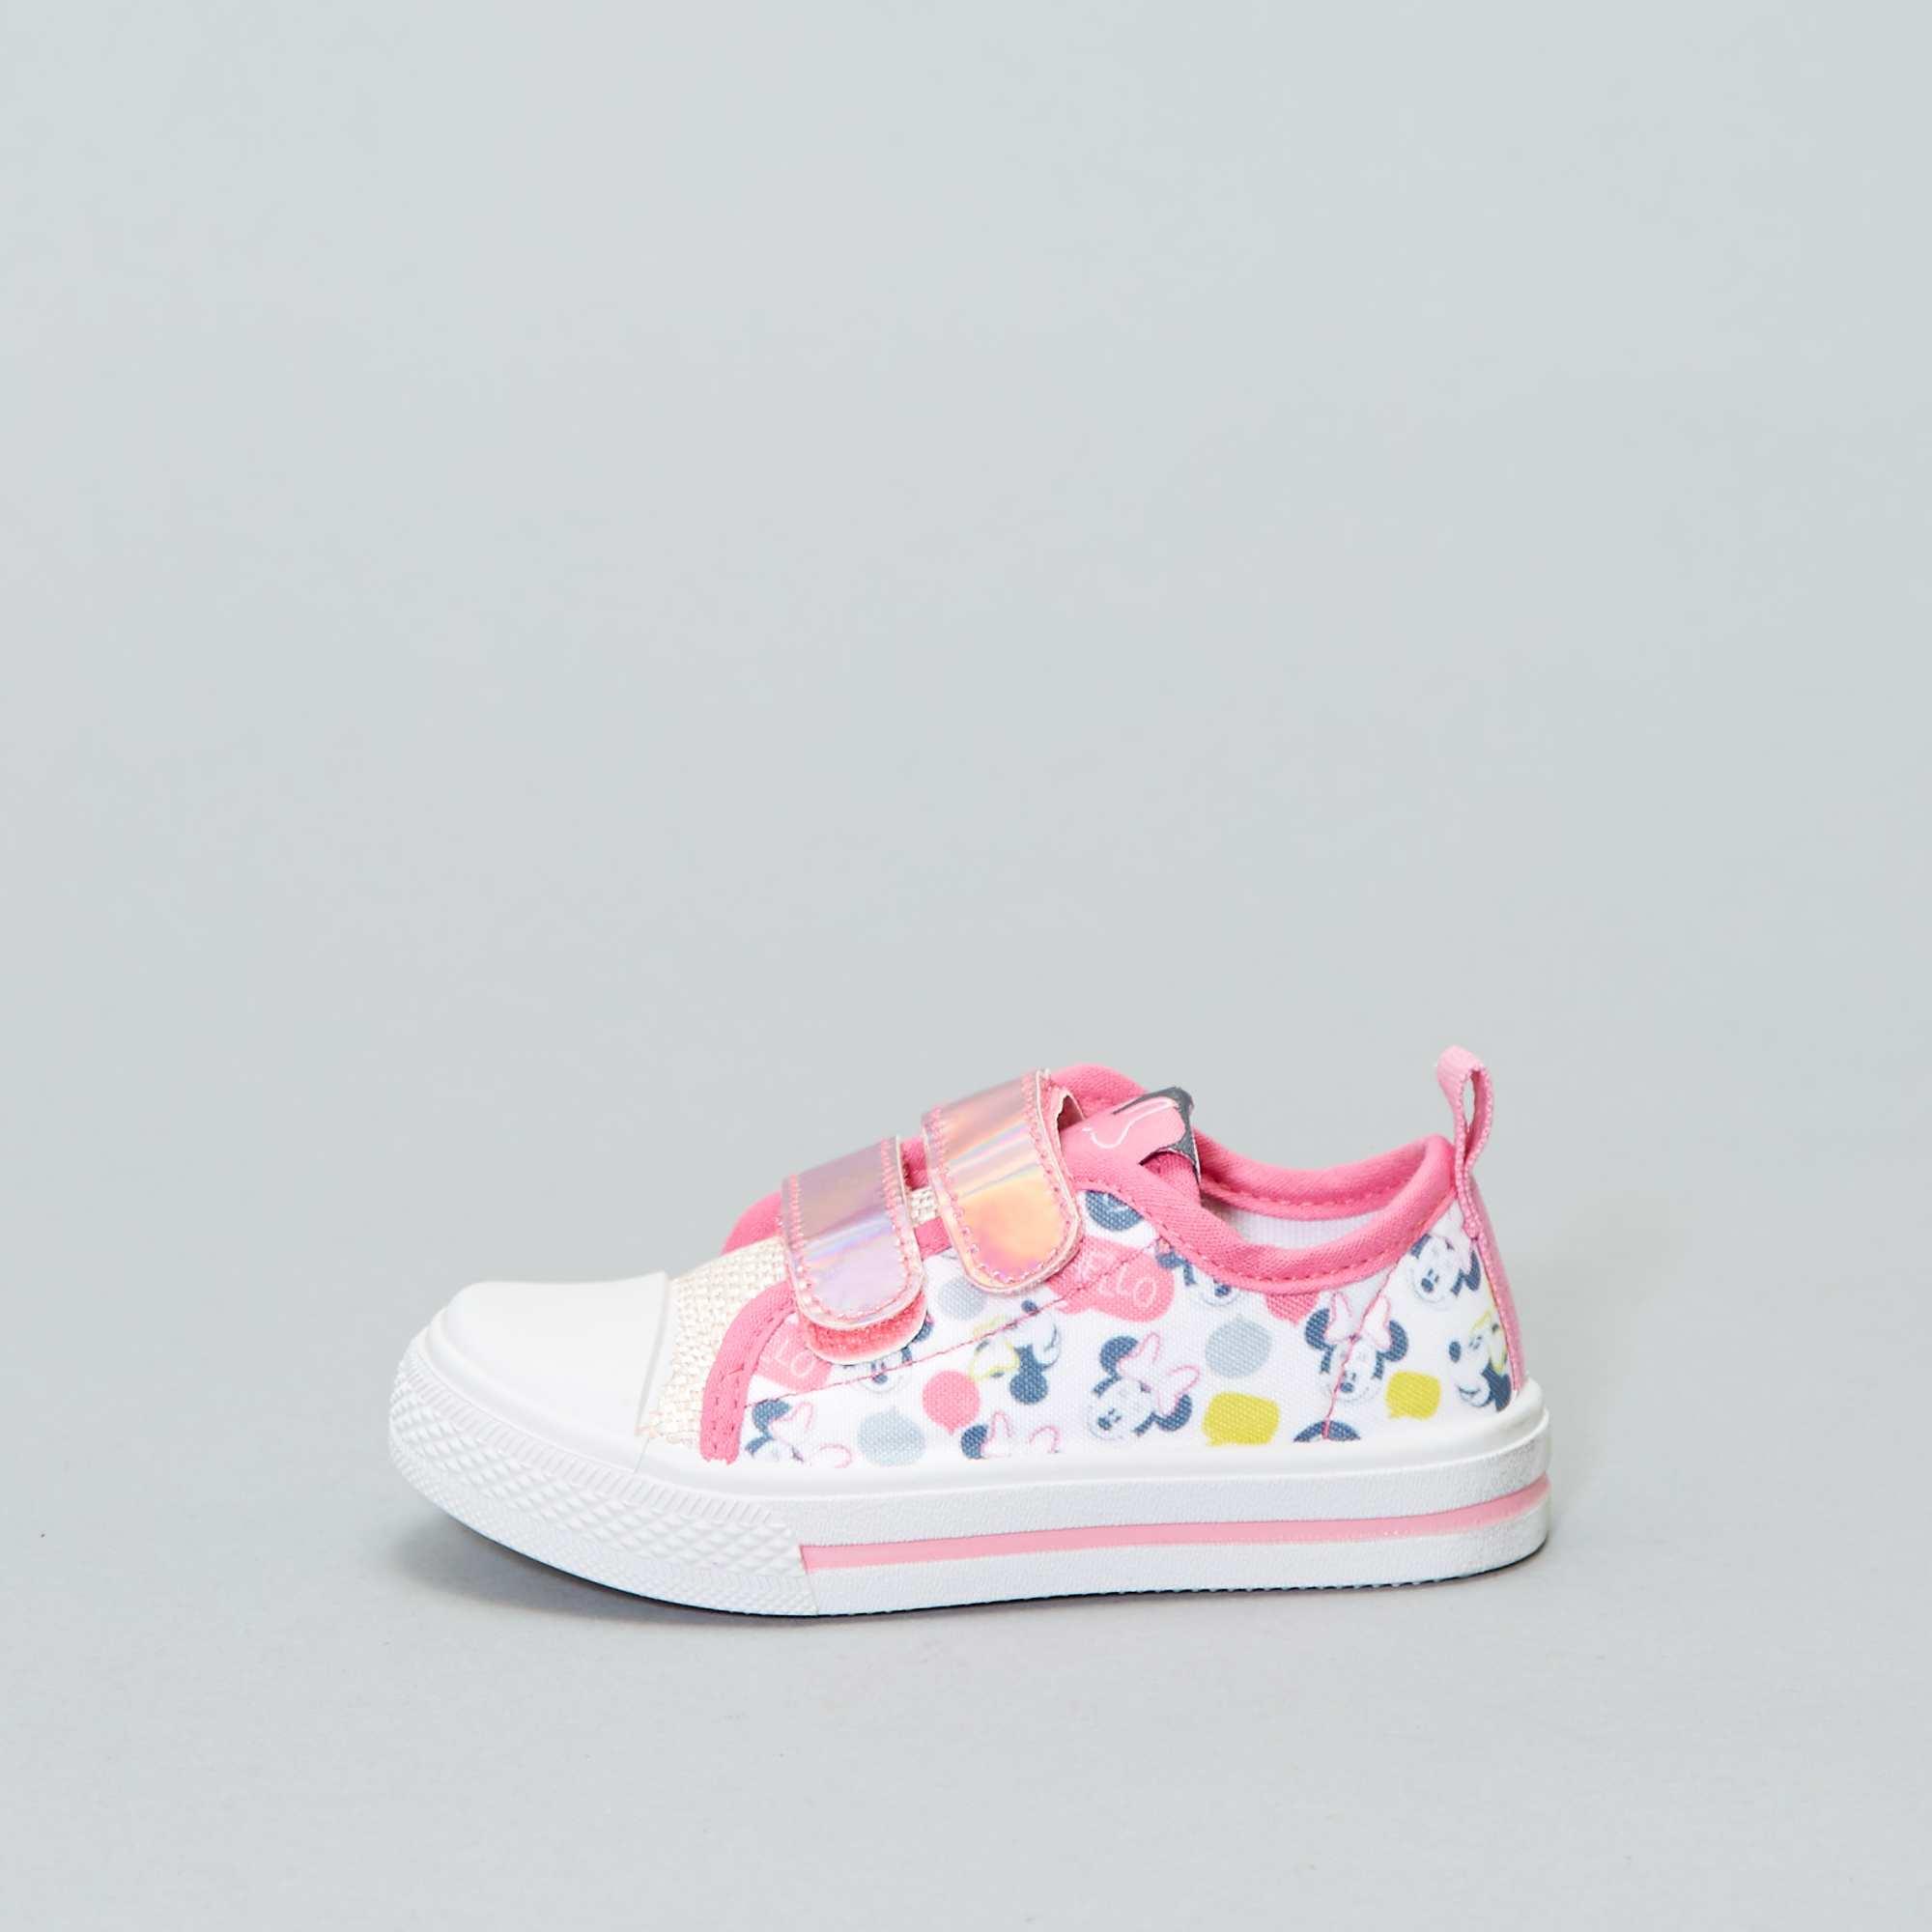 0108de8a80 Lage stoffen  Minnie Mouse -sneakers van  Disney  Kinderkleding ...